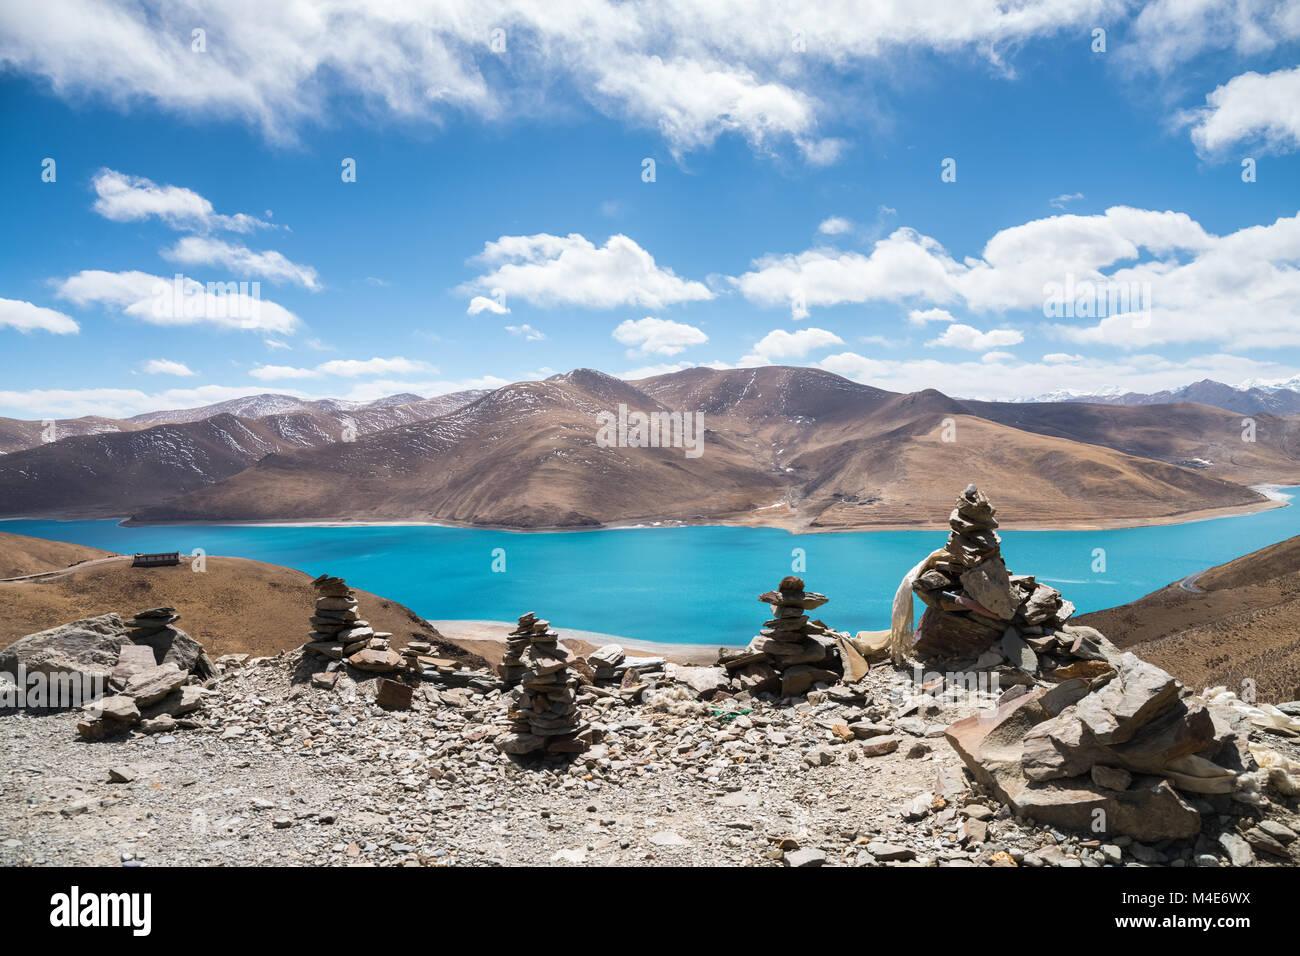 tibet holy yamdrok lake - Stock Image